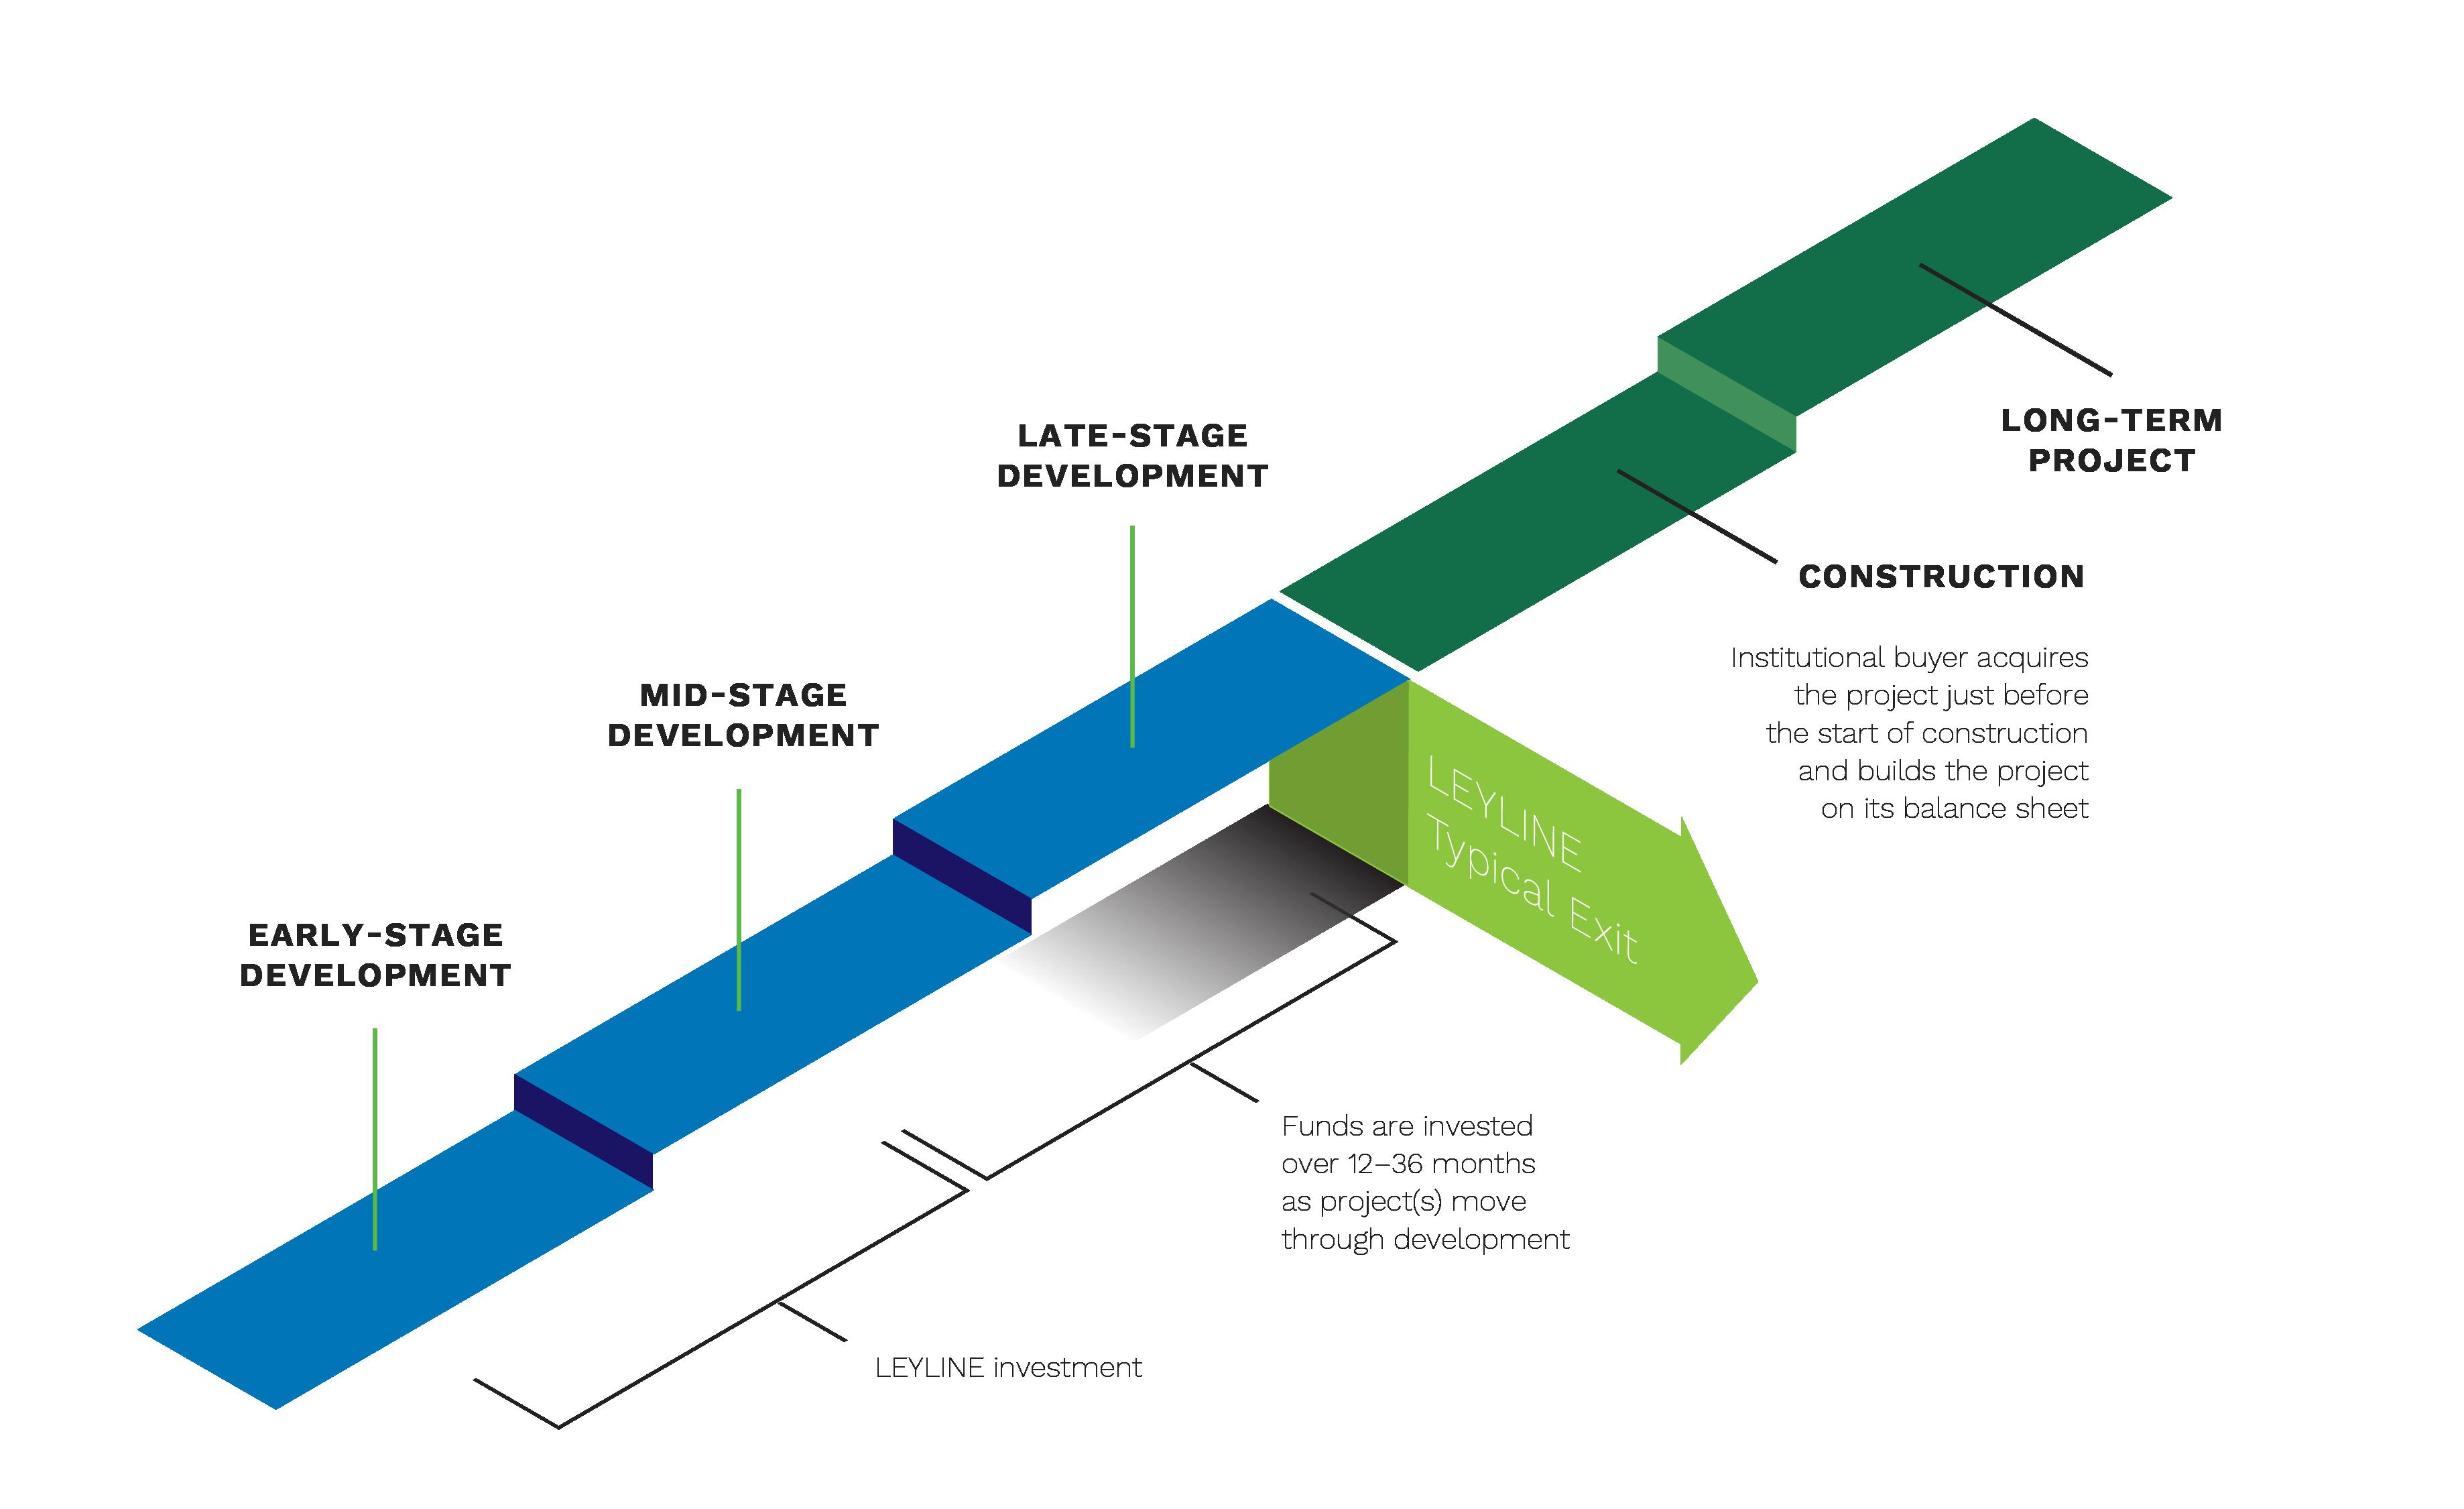 Leyline Investment Timeline